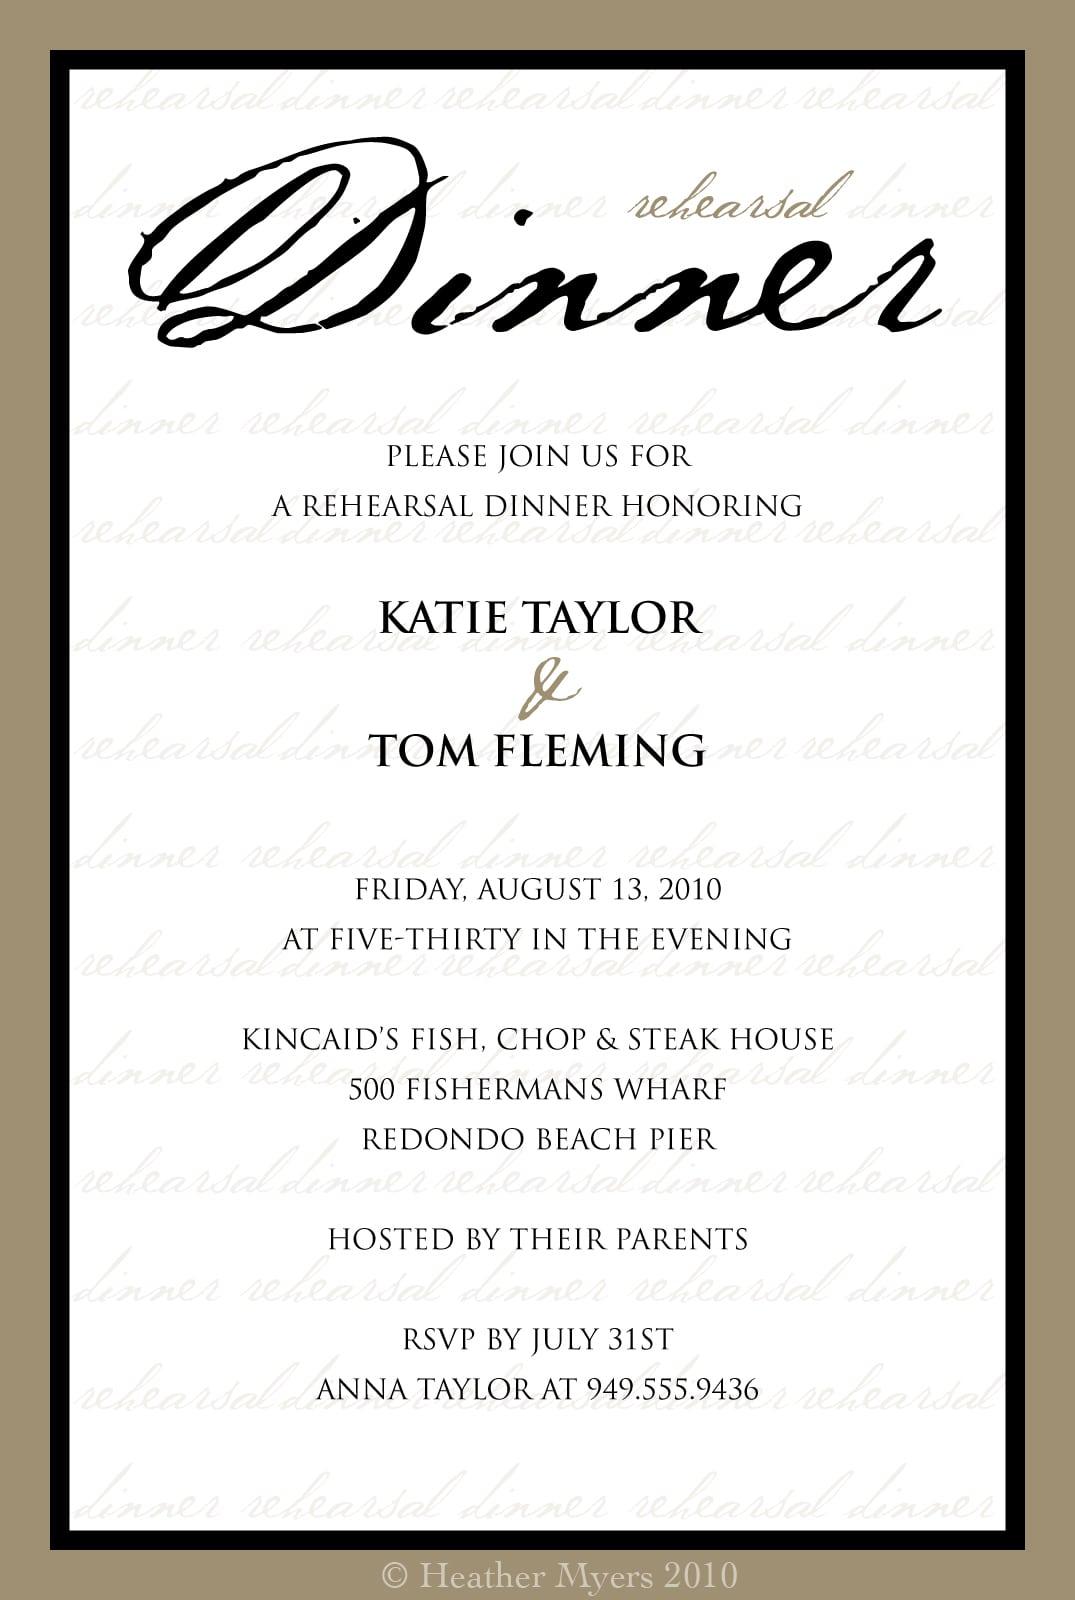 Free Printable Rehearsal Dinner Invitations